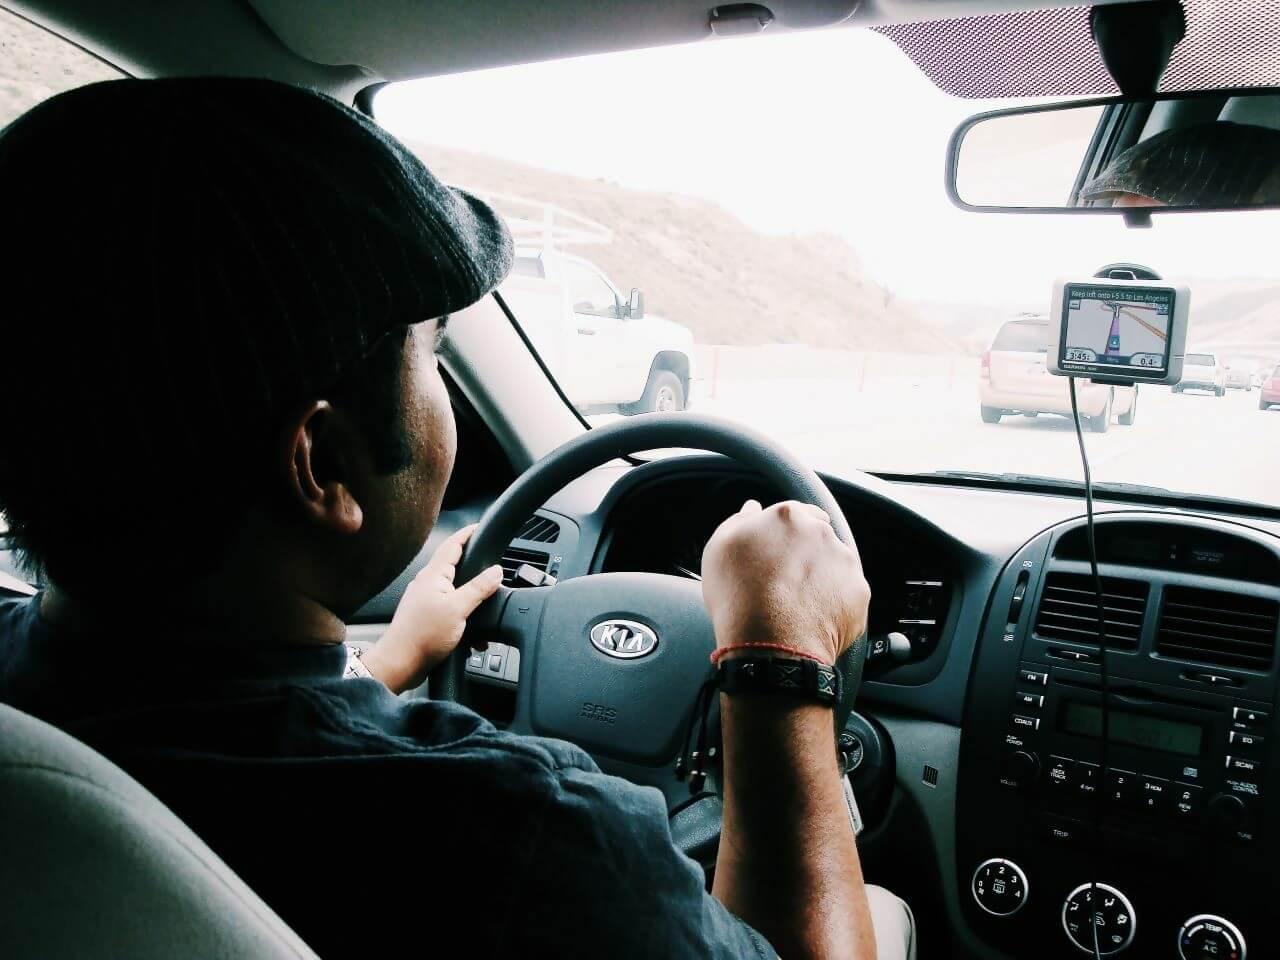 Man driving a Kia car with sat nav